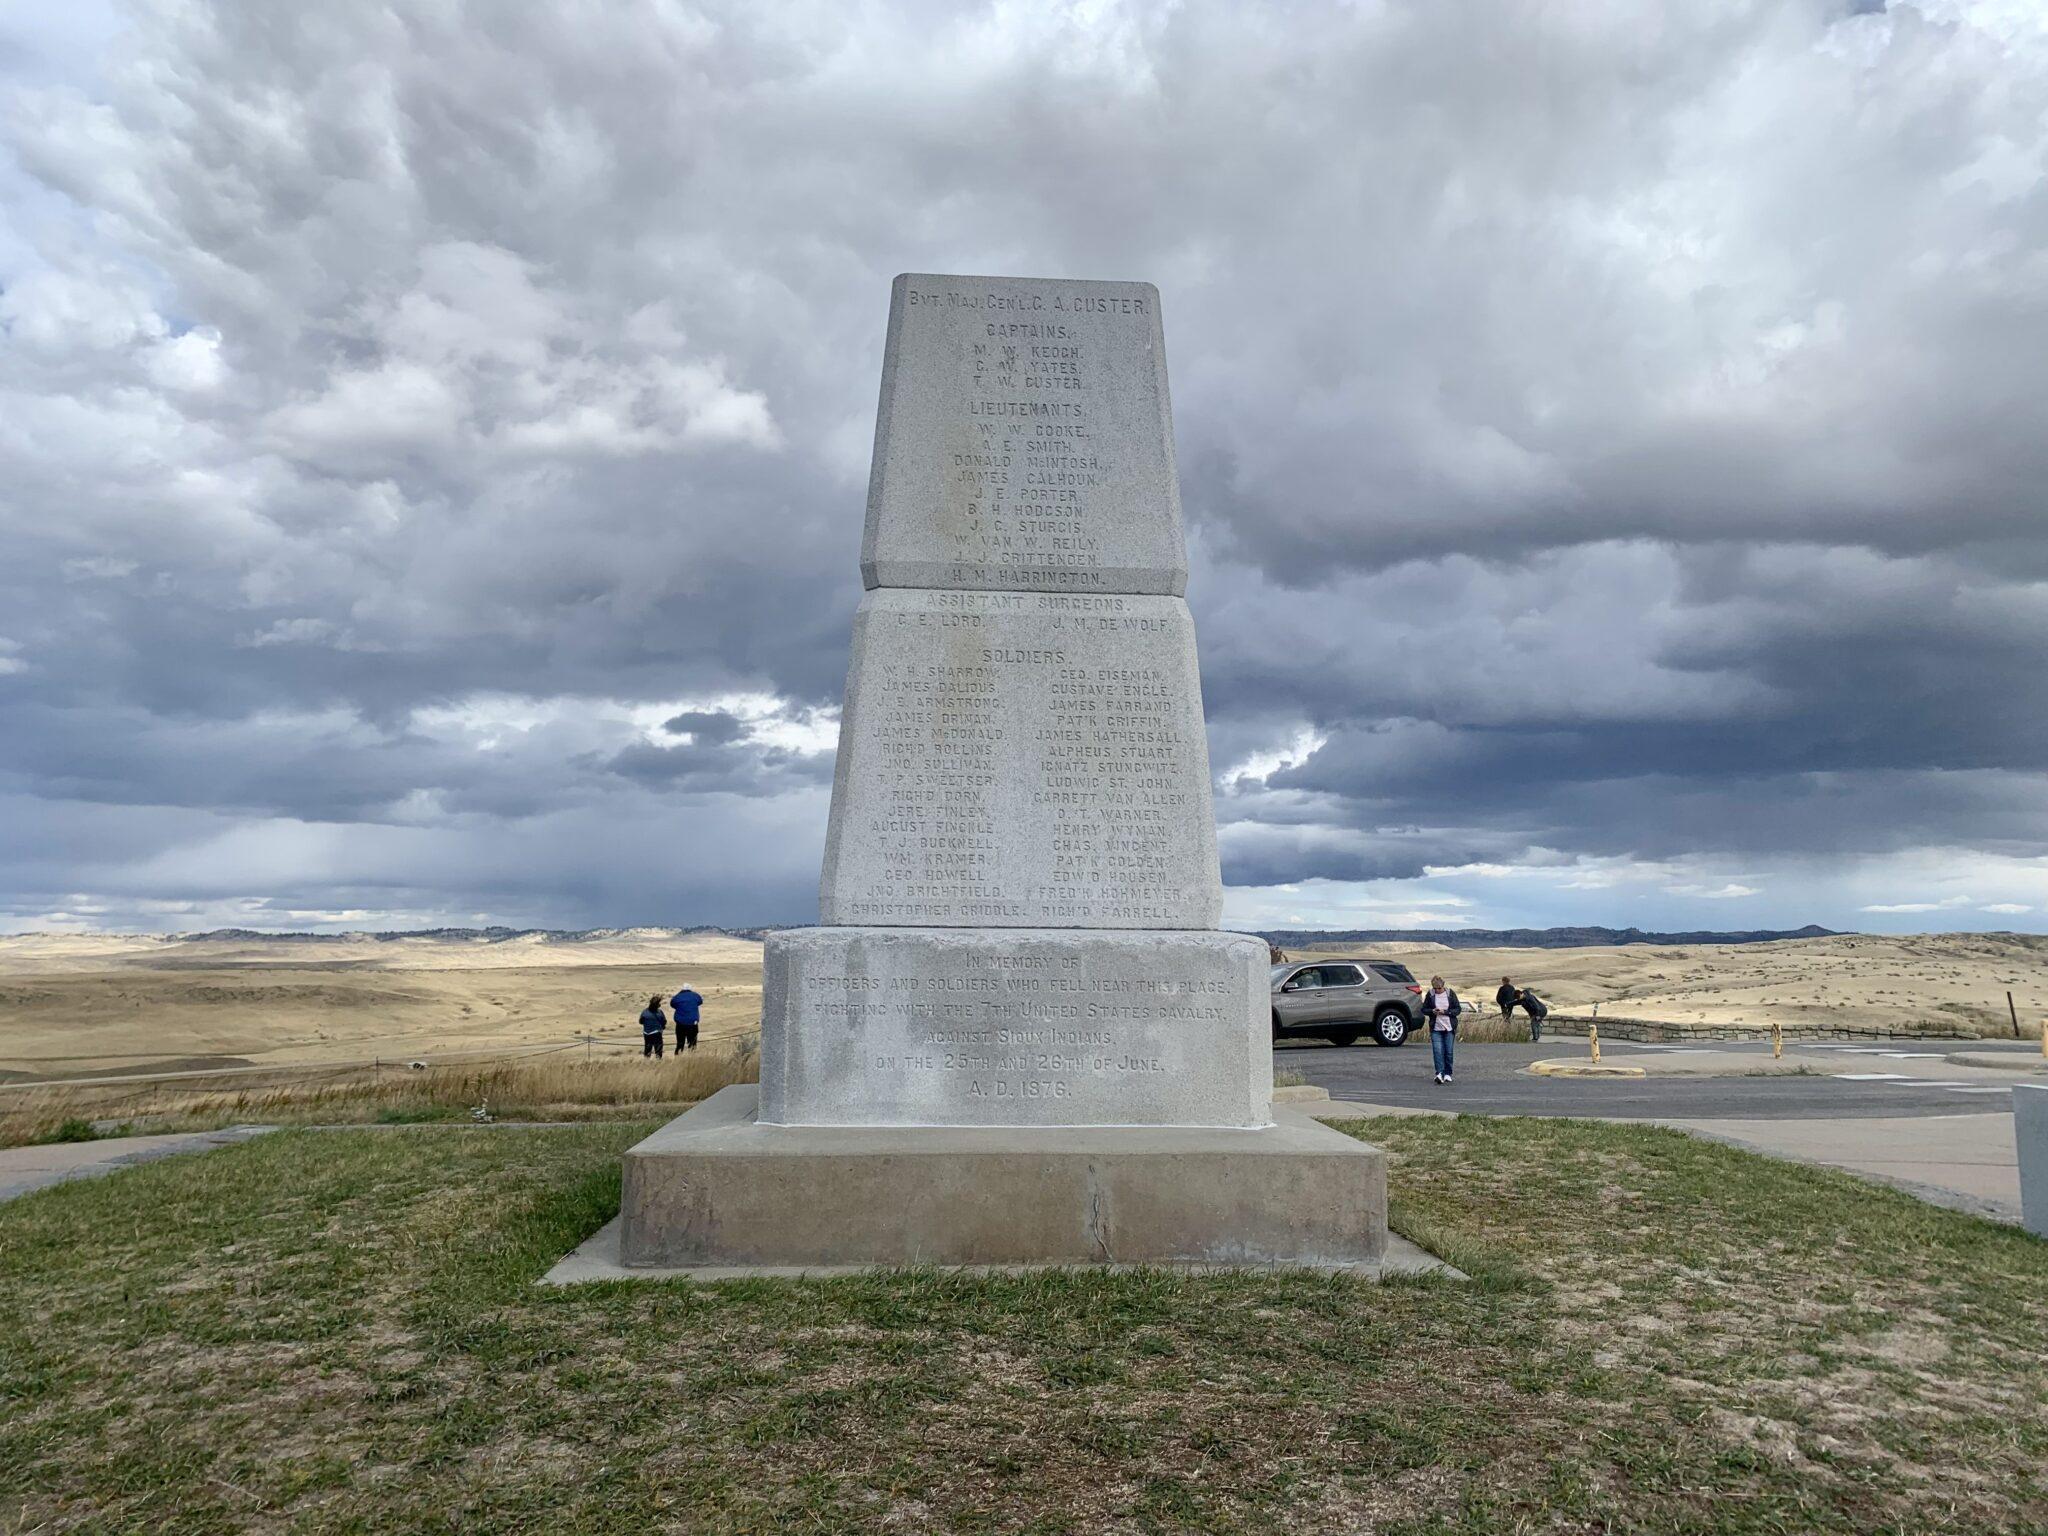 Memorial statue at Little Bighorn